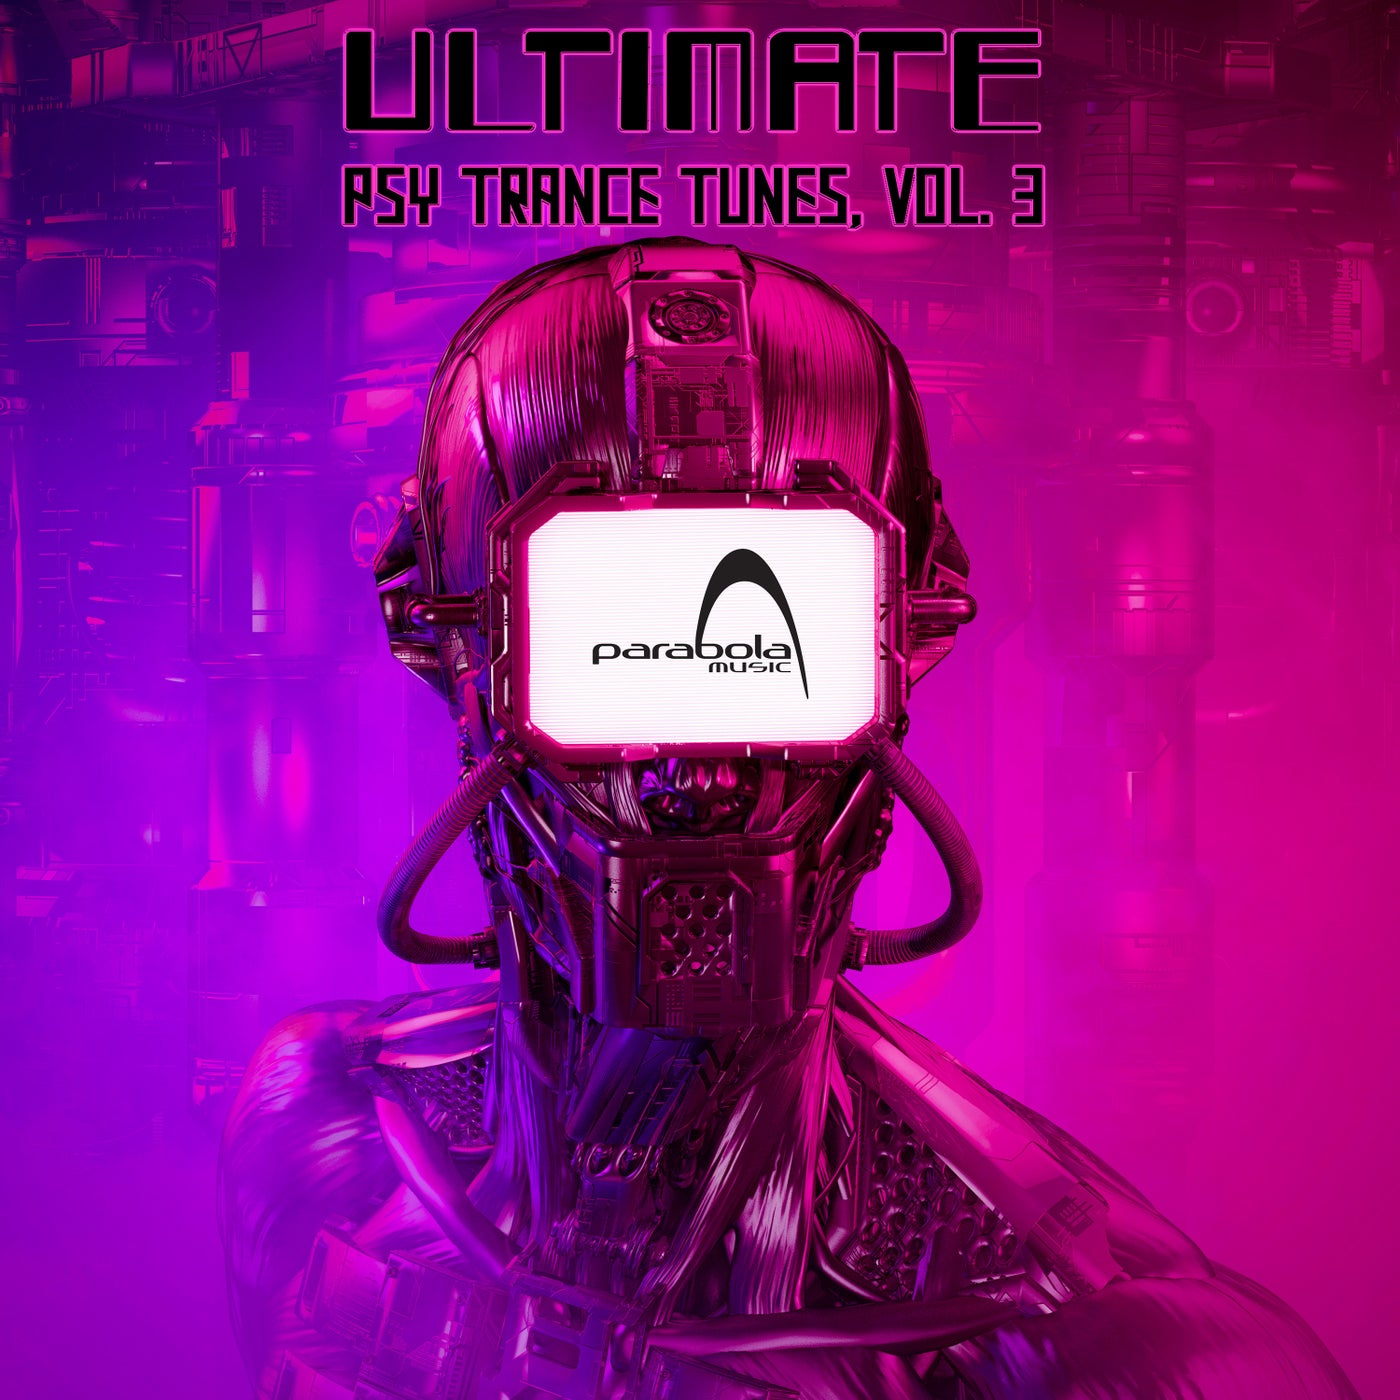 Ultimate Psy Trance Tunes, Vol. 3